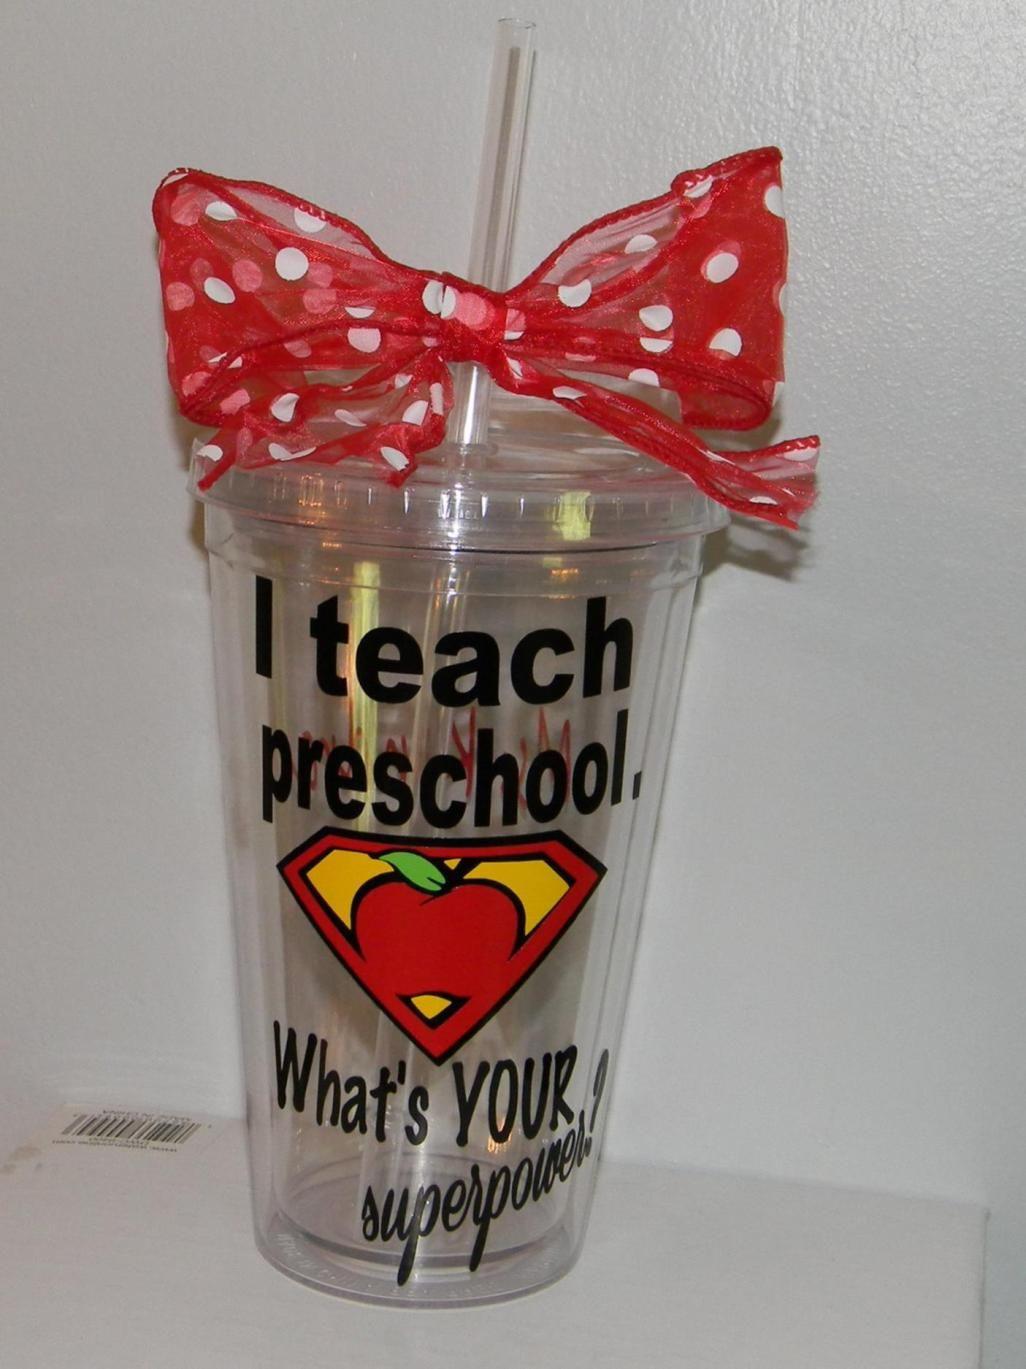 67 Inspiring Teachers Gifts For Christmas Ideas Have Fun Decor Daycare Teacher Gifts Preschool Teacher Gifts Preschool Gifts